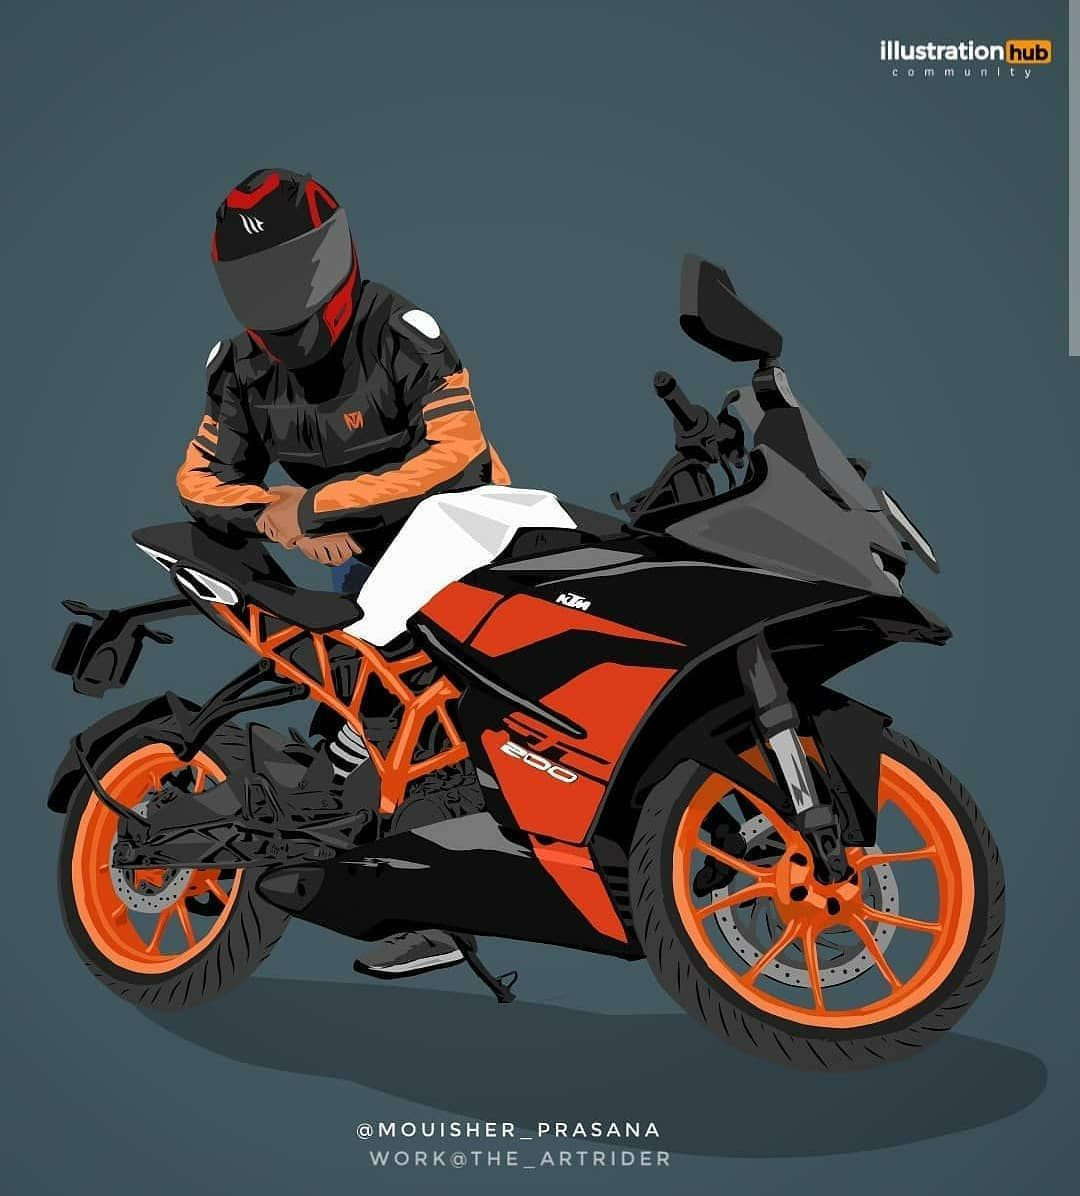 Ktm Model On Instagram Follow My Ktm Bike Page Ktm Model Ktm Model Ktm Model Ktm Model Bike Drawing Cartoon Girl Images Motorcycle Drawing Download ktm wallpaper gif